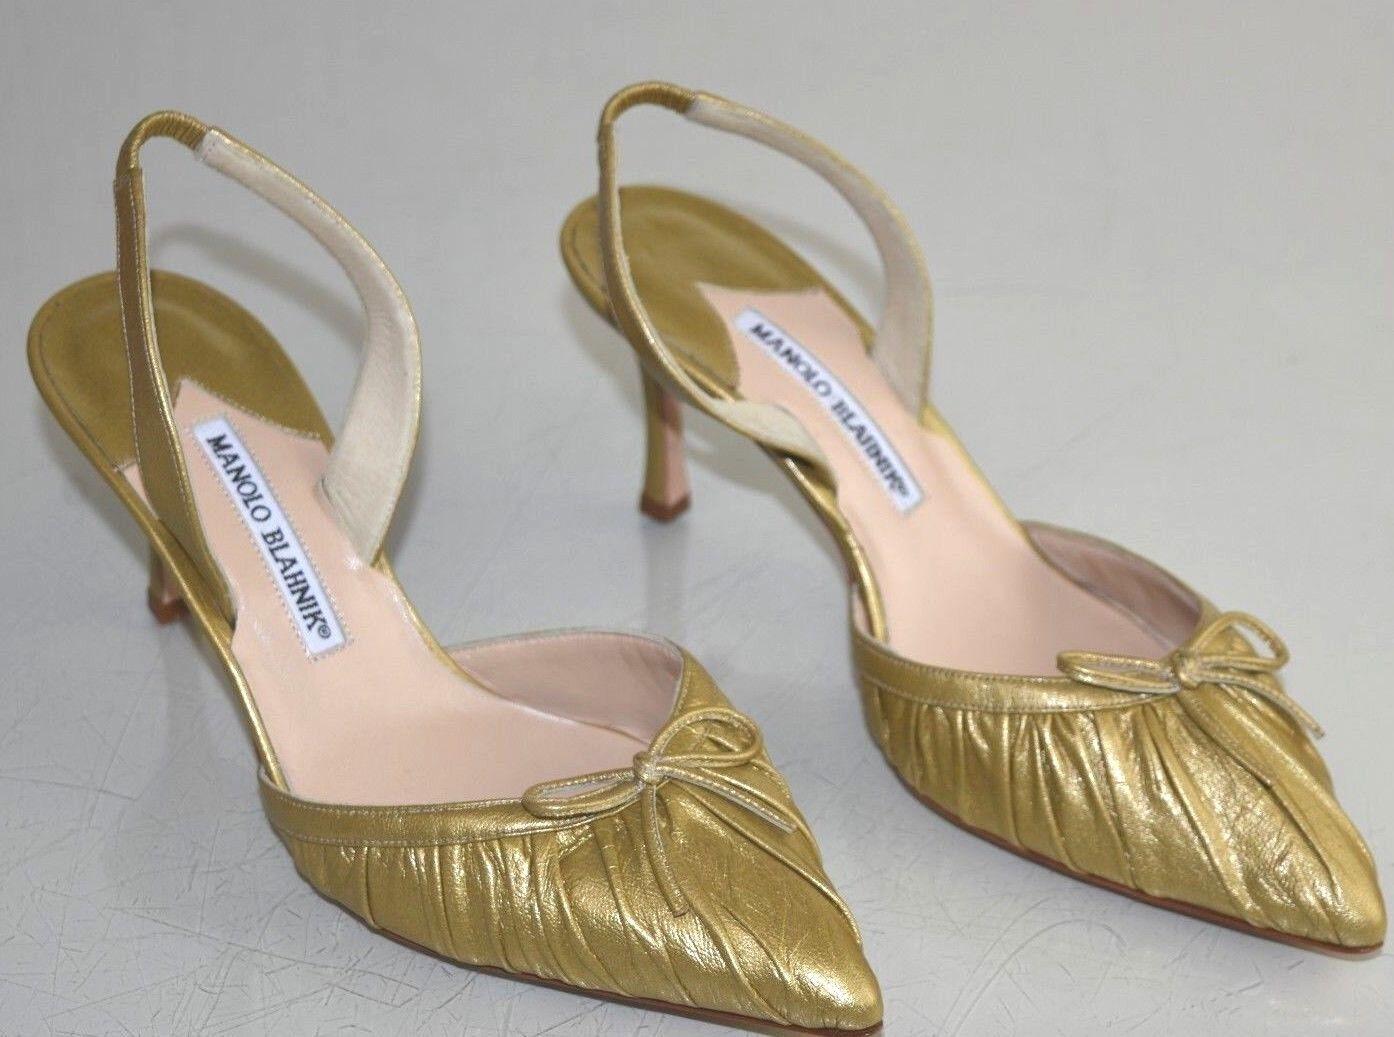 New Manolo Blahnik RAGANGISLI 70 Carolyne Pump Leather Halter gold Bow shoes 37